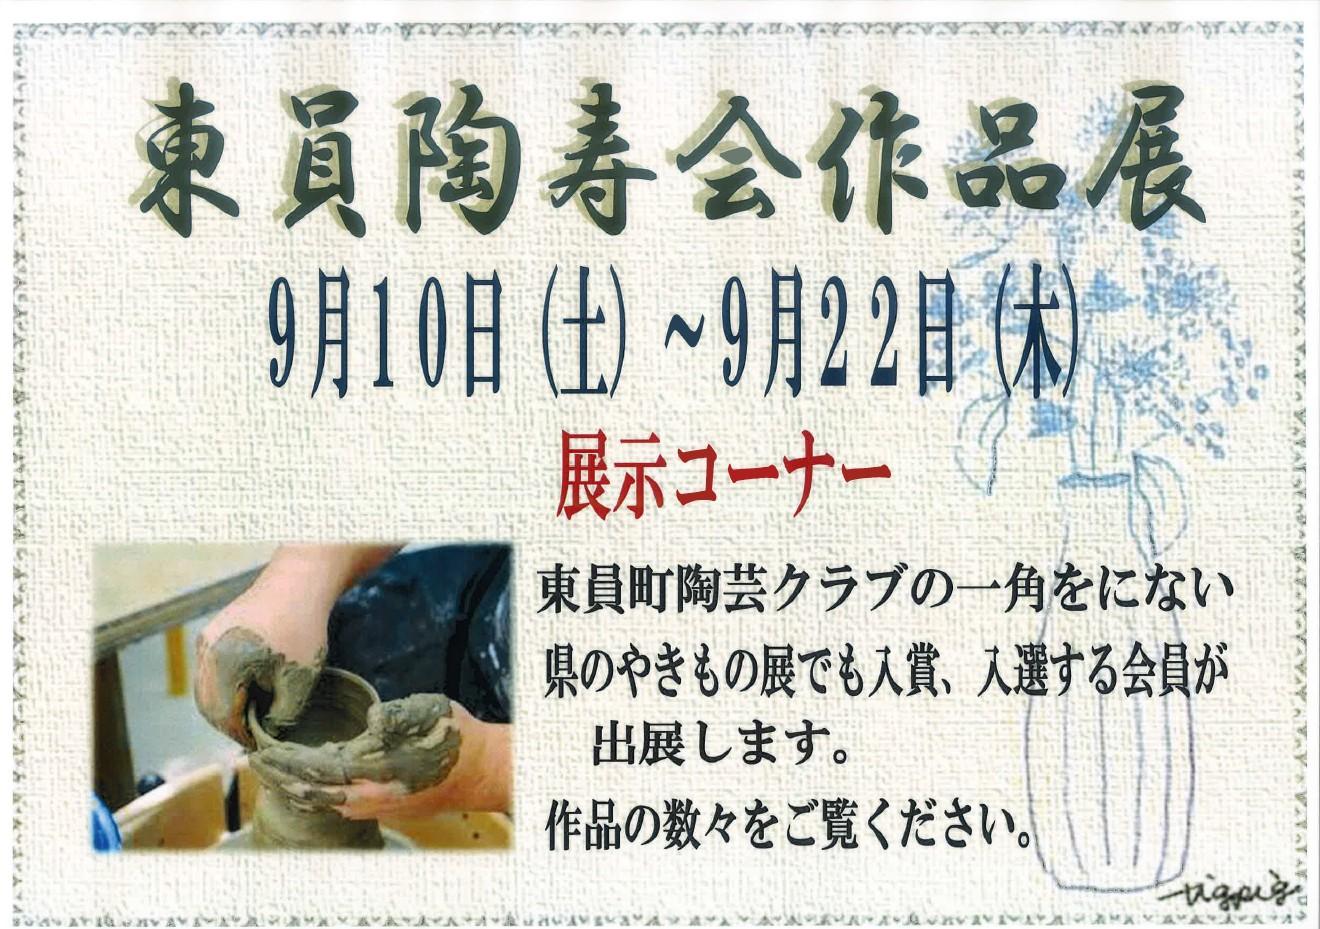 http://www.ajisainosato.com/info/images/2016y08m28d_181449084.jpg